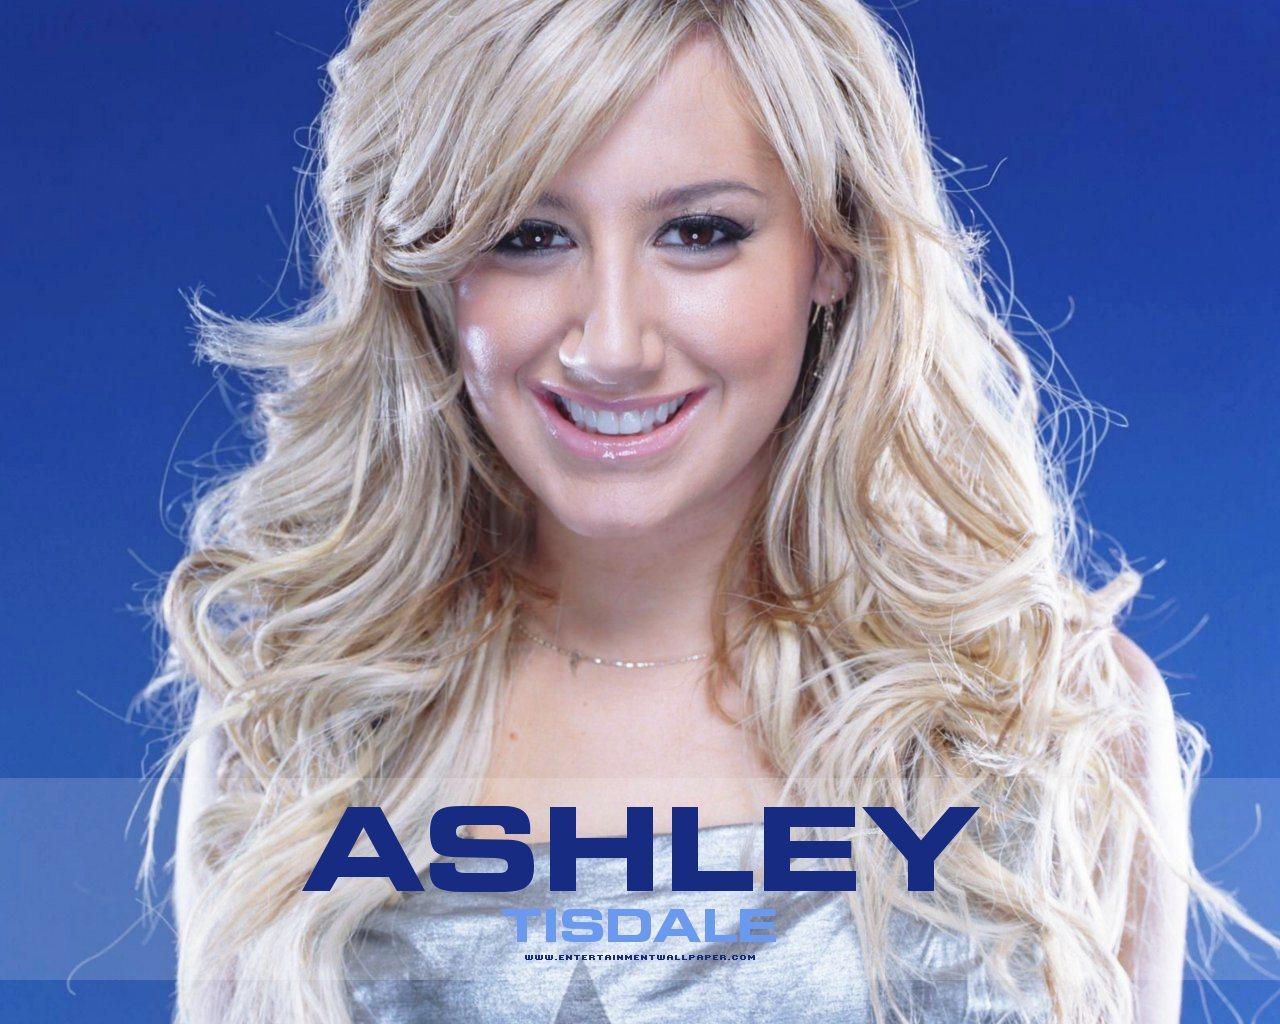 Ashley Tisdale In Guilty Pleasure HD Free Wallpapers - ashley tisdale in guilty pleasure wallpapers